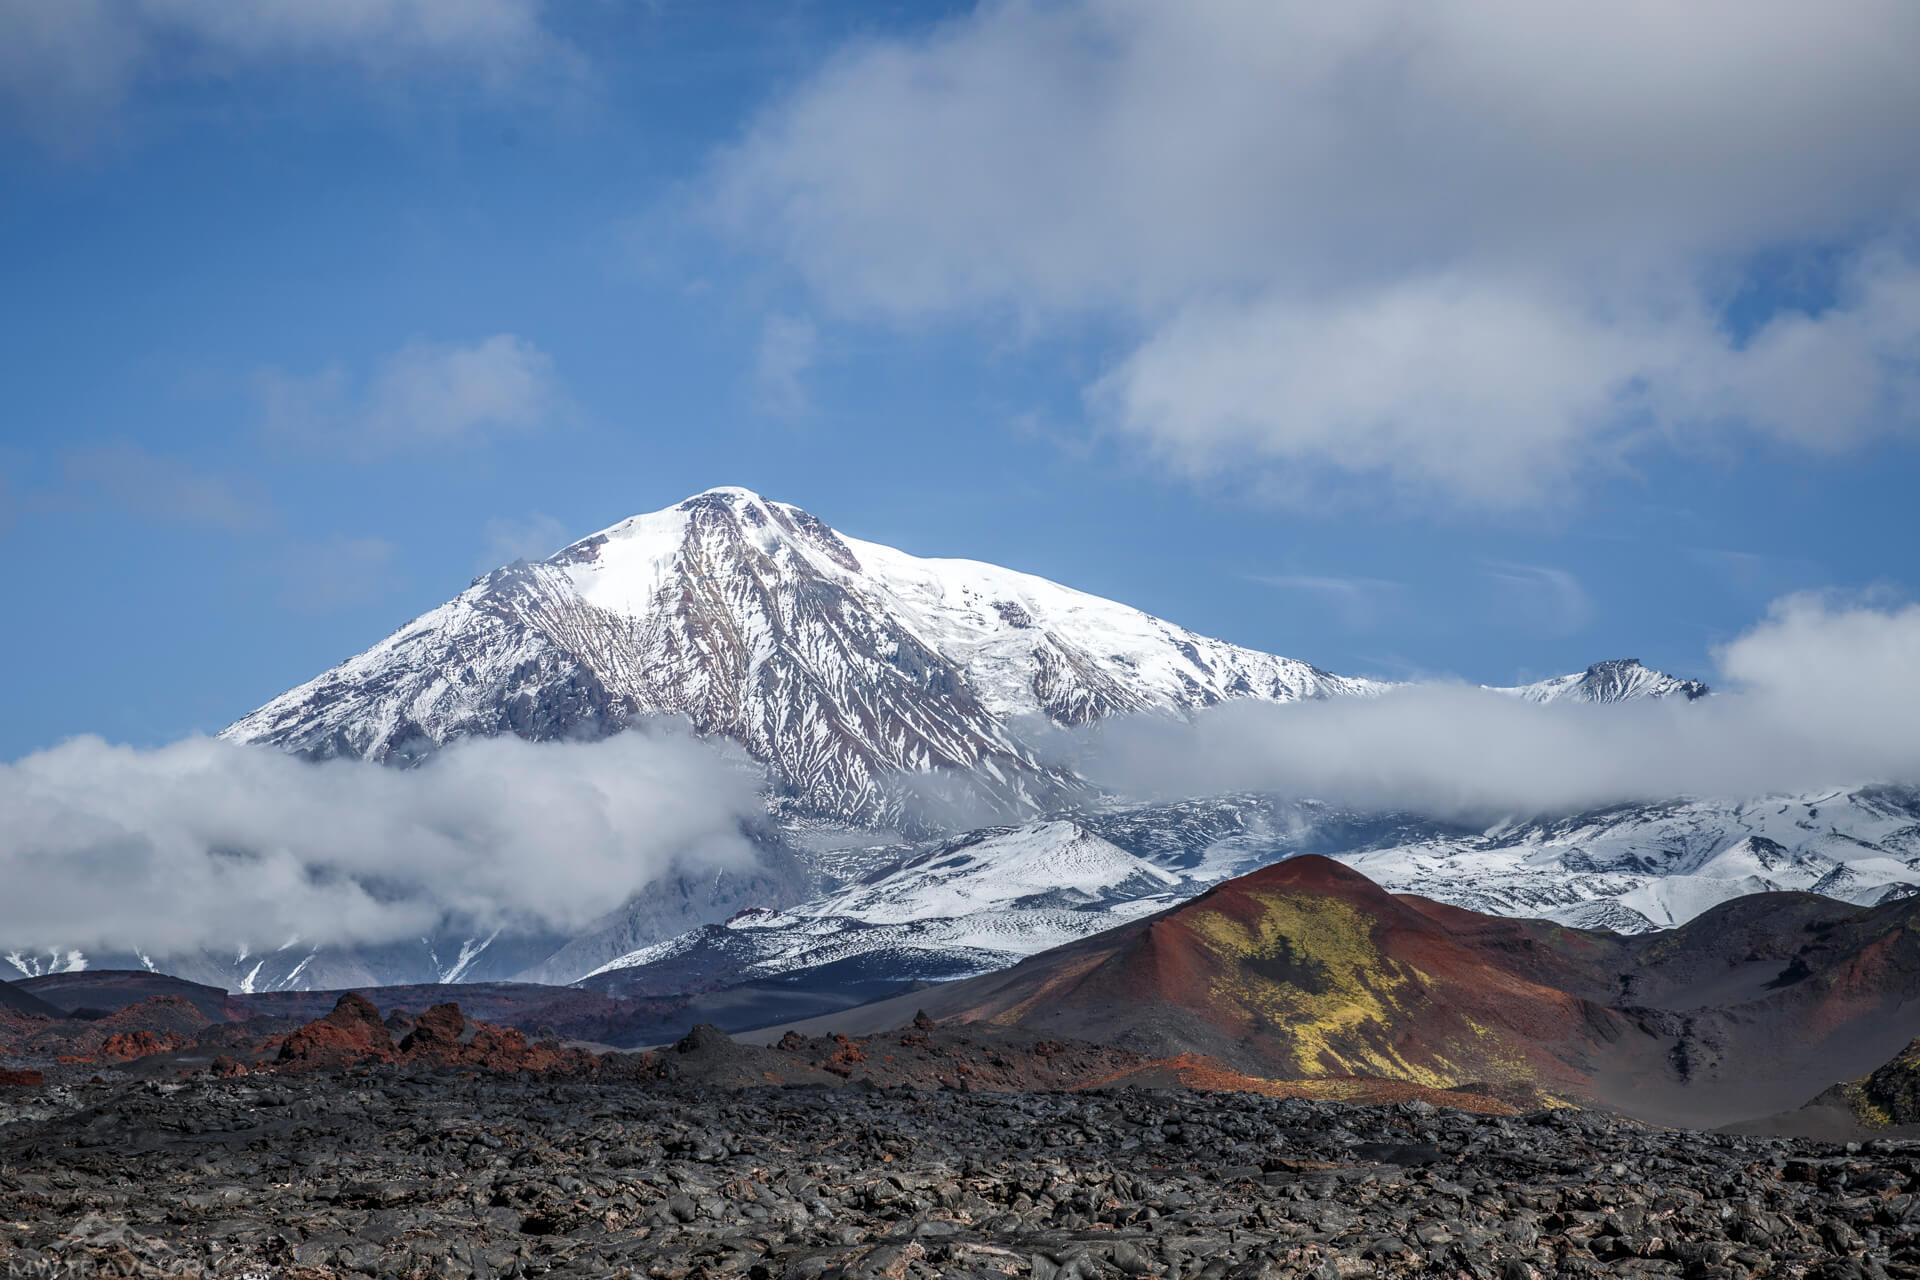 вулкан на полуострове камчатка